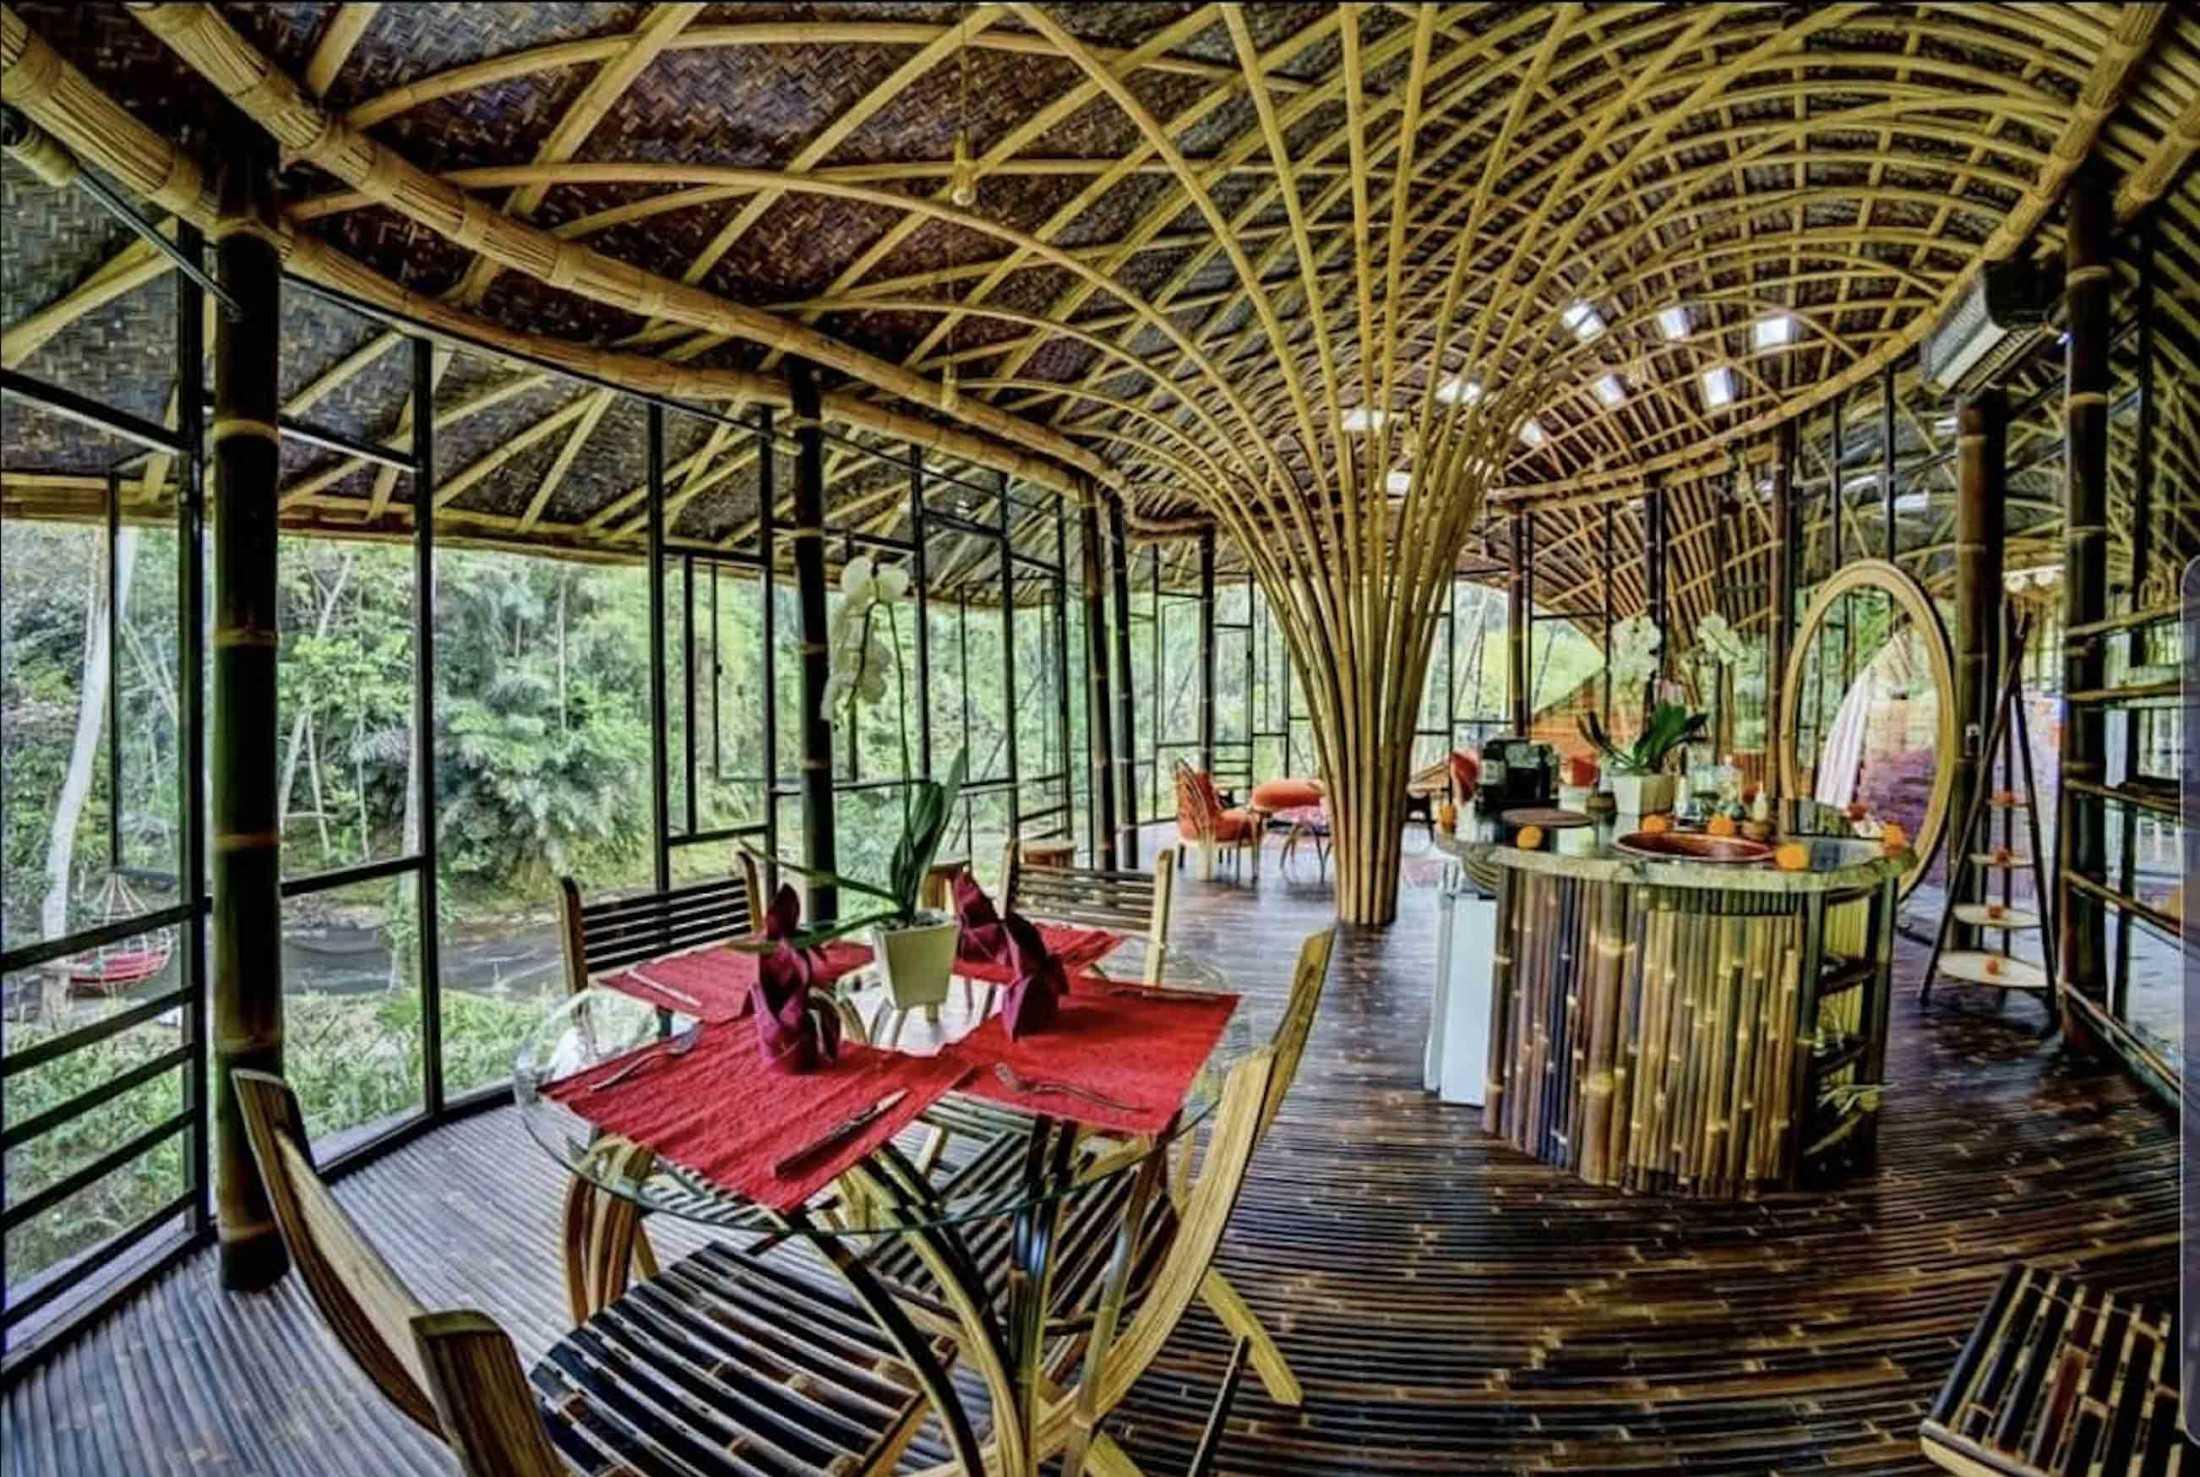 Agung Budi Raharsa | Architecture & Engineering Riverbend Bamboo House - Bali Bali, Indonesia Bali, Indonesia Agung-Budi-Raharsa-Riverbend-House-Bali  88714